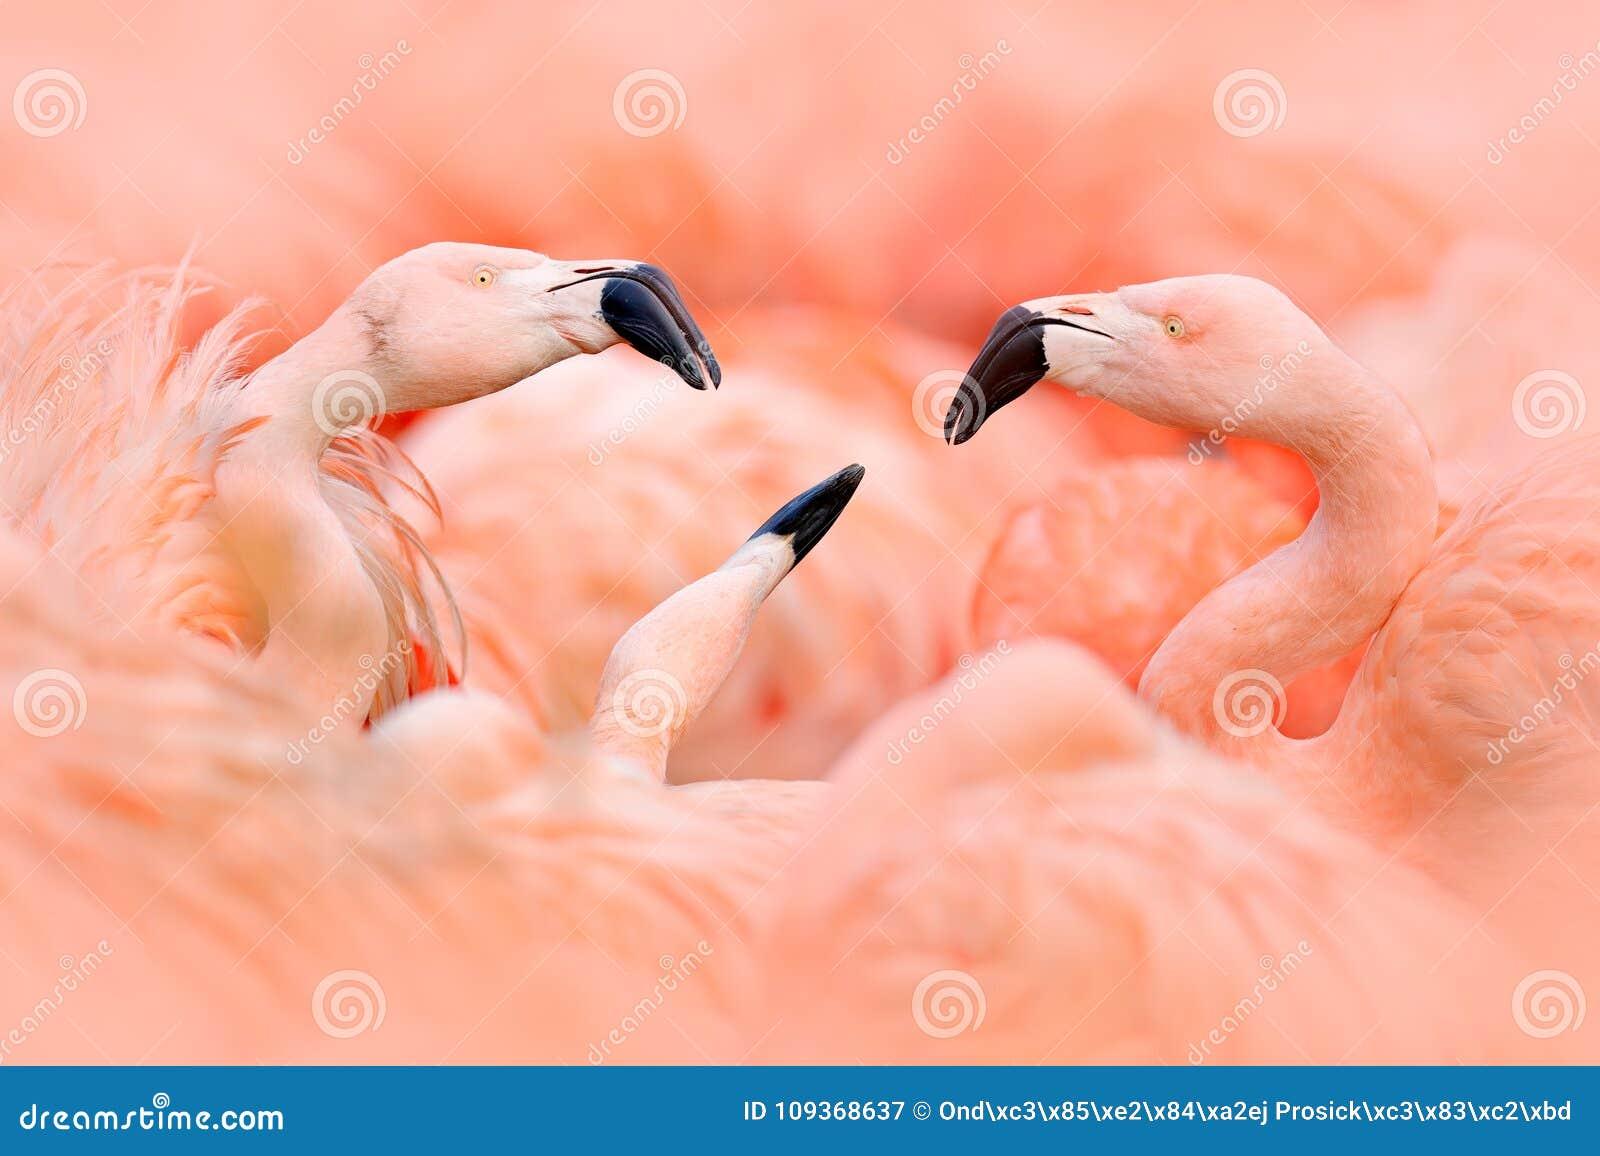 Flaningo fight. American flamingo, Phoenicopterus rubernice, pink big bird, dancing in water, animal in the nature habitat, Cuba,